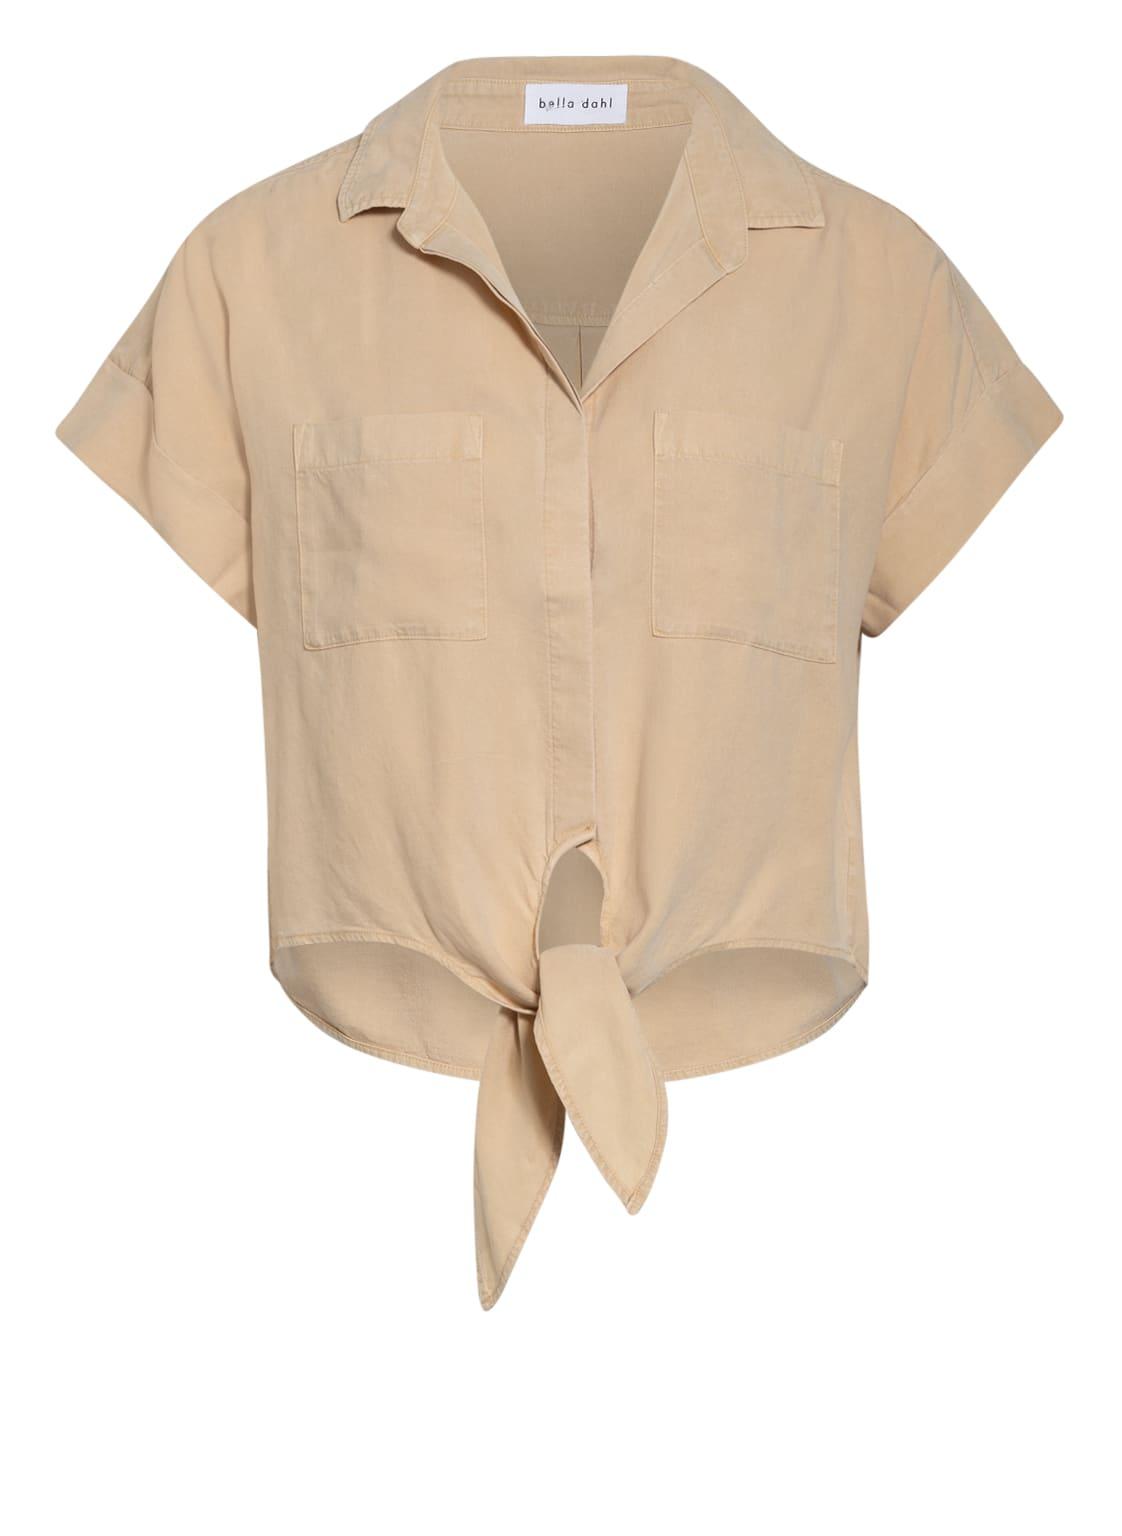 Image of Bella Dahl Cropped-Hemdbluse beige